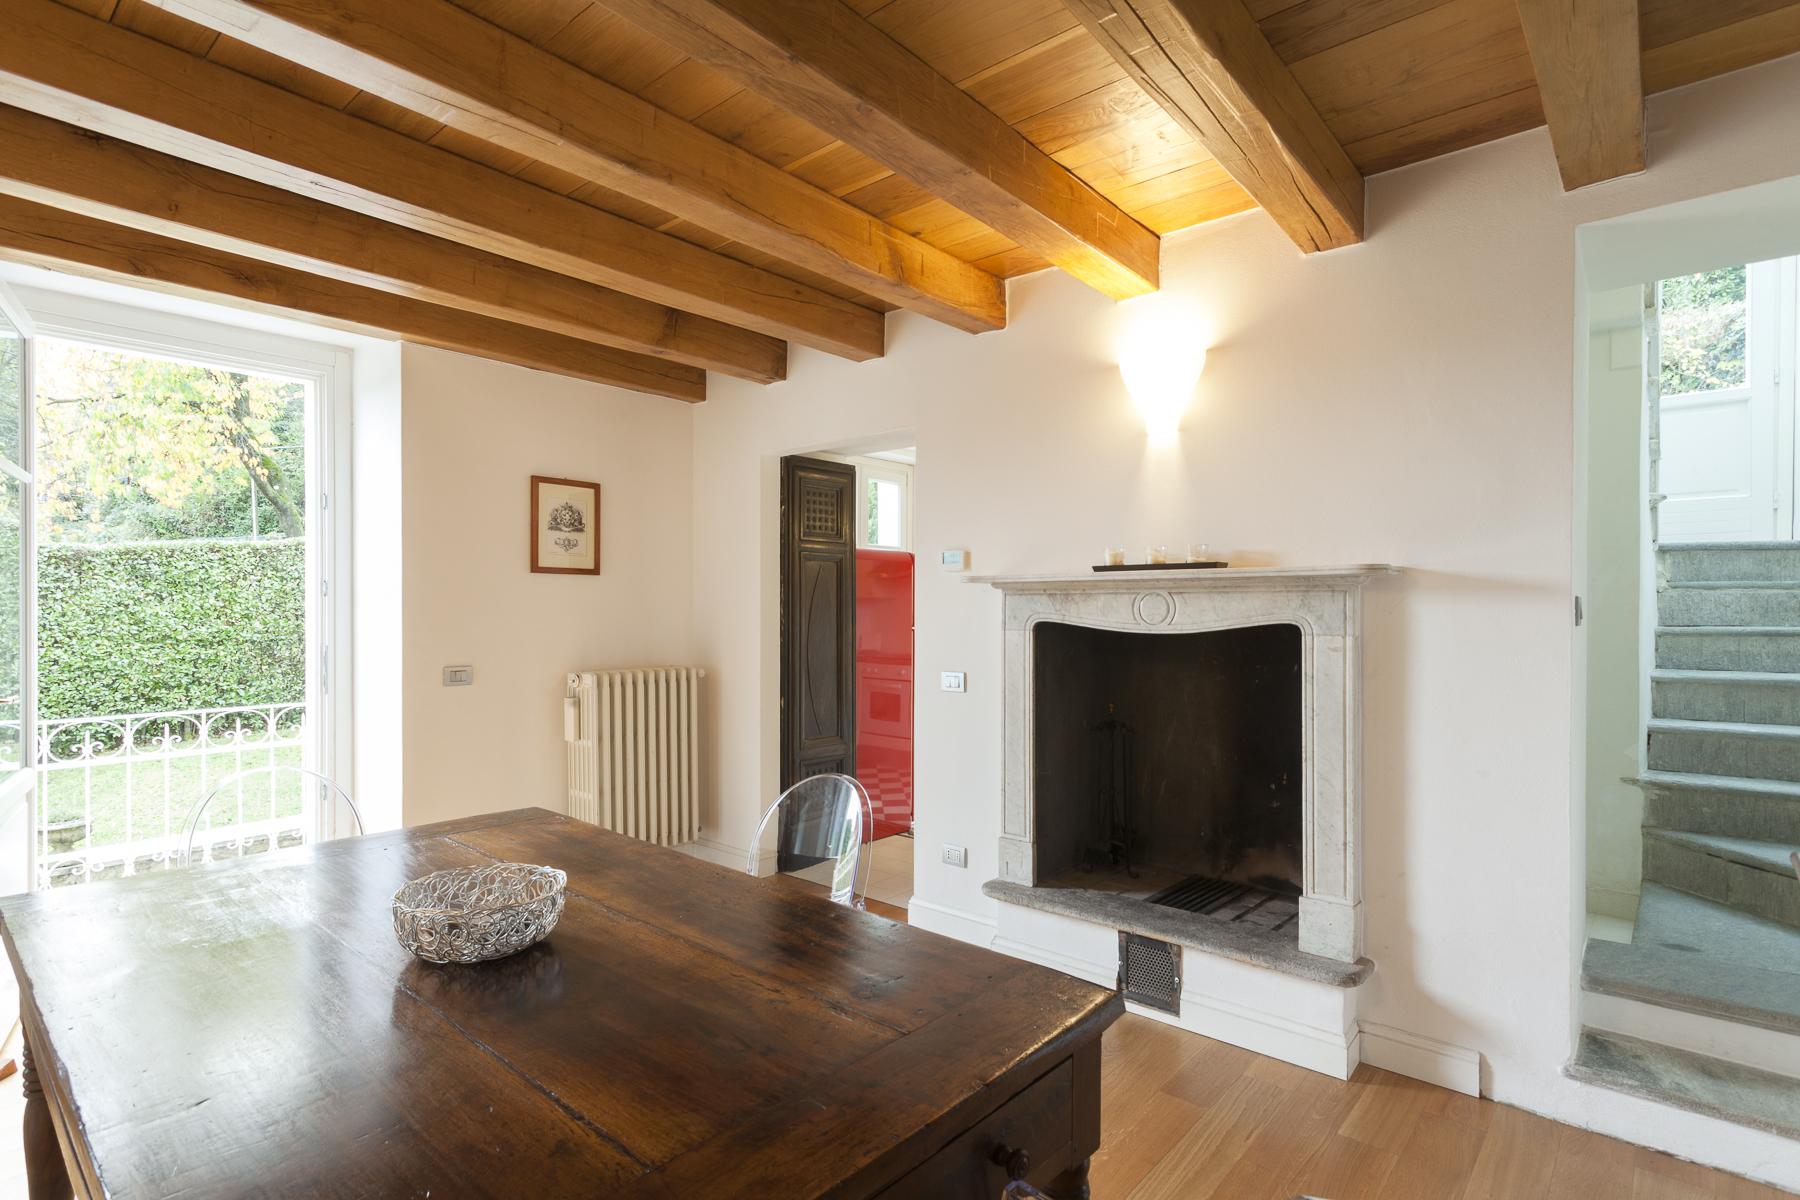 Villa in Vendita a Stresa: 5 locali, 360 mq - Foto 9